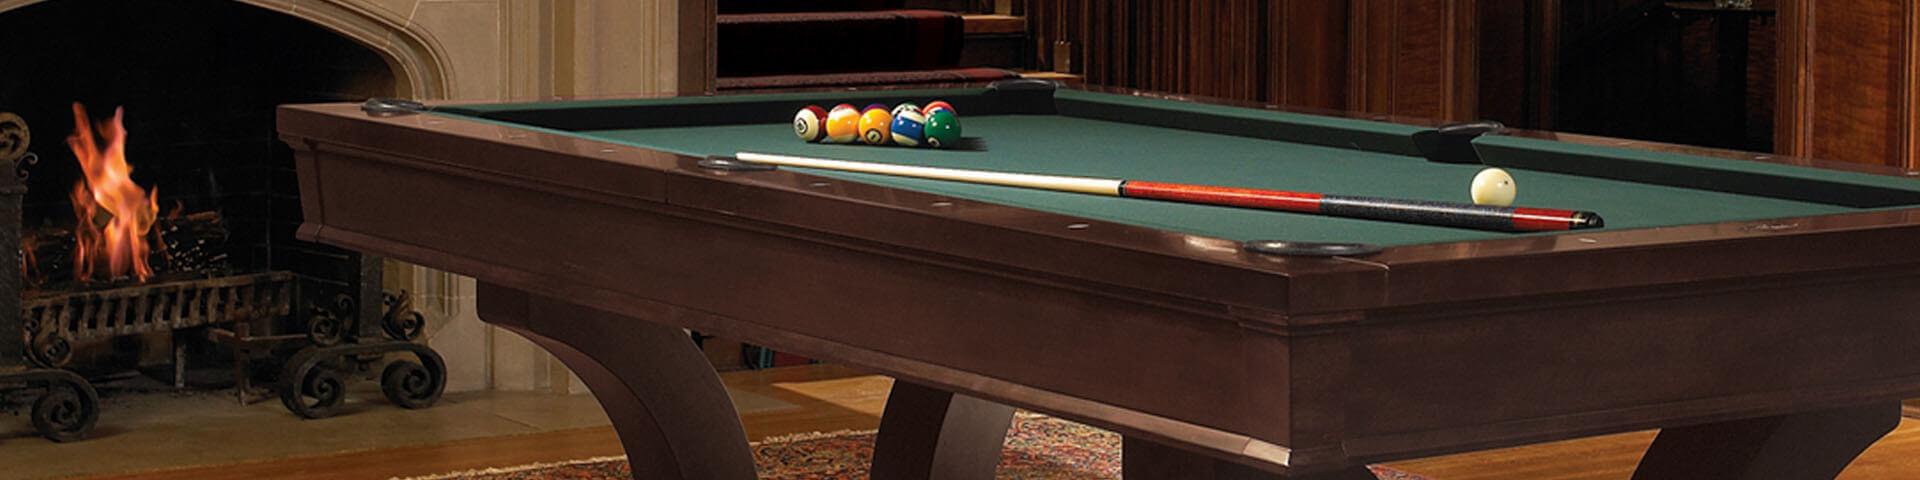 Brunswick Pool Tables San Diego Hot Spring Spas - Brunswick windsor pool table